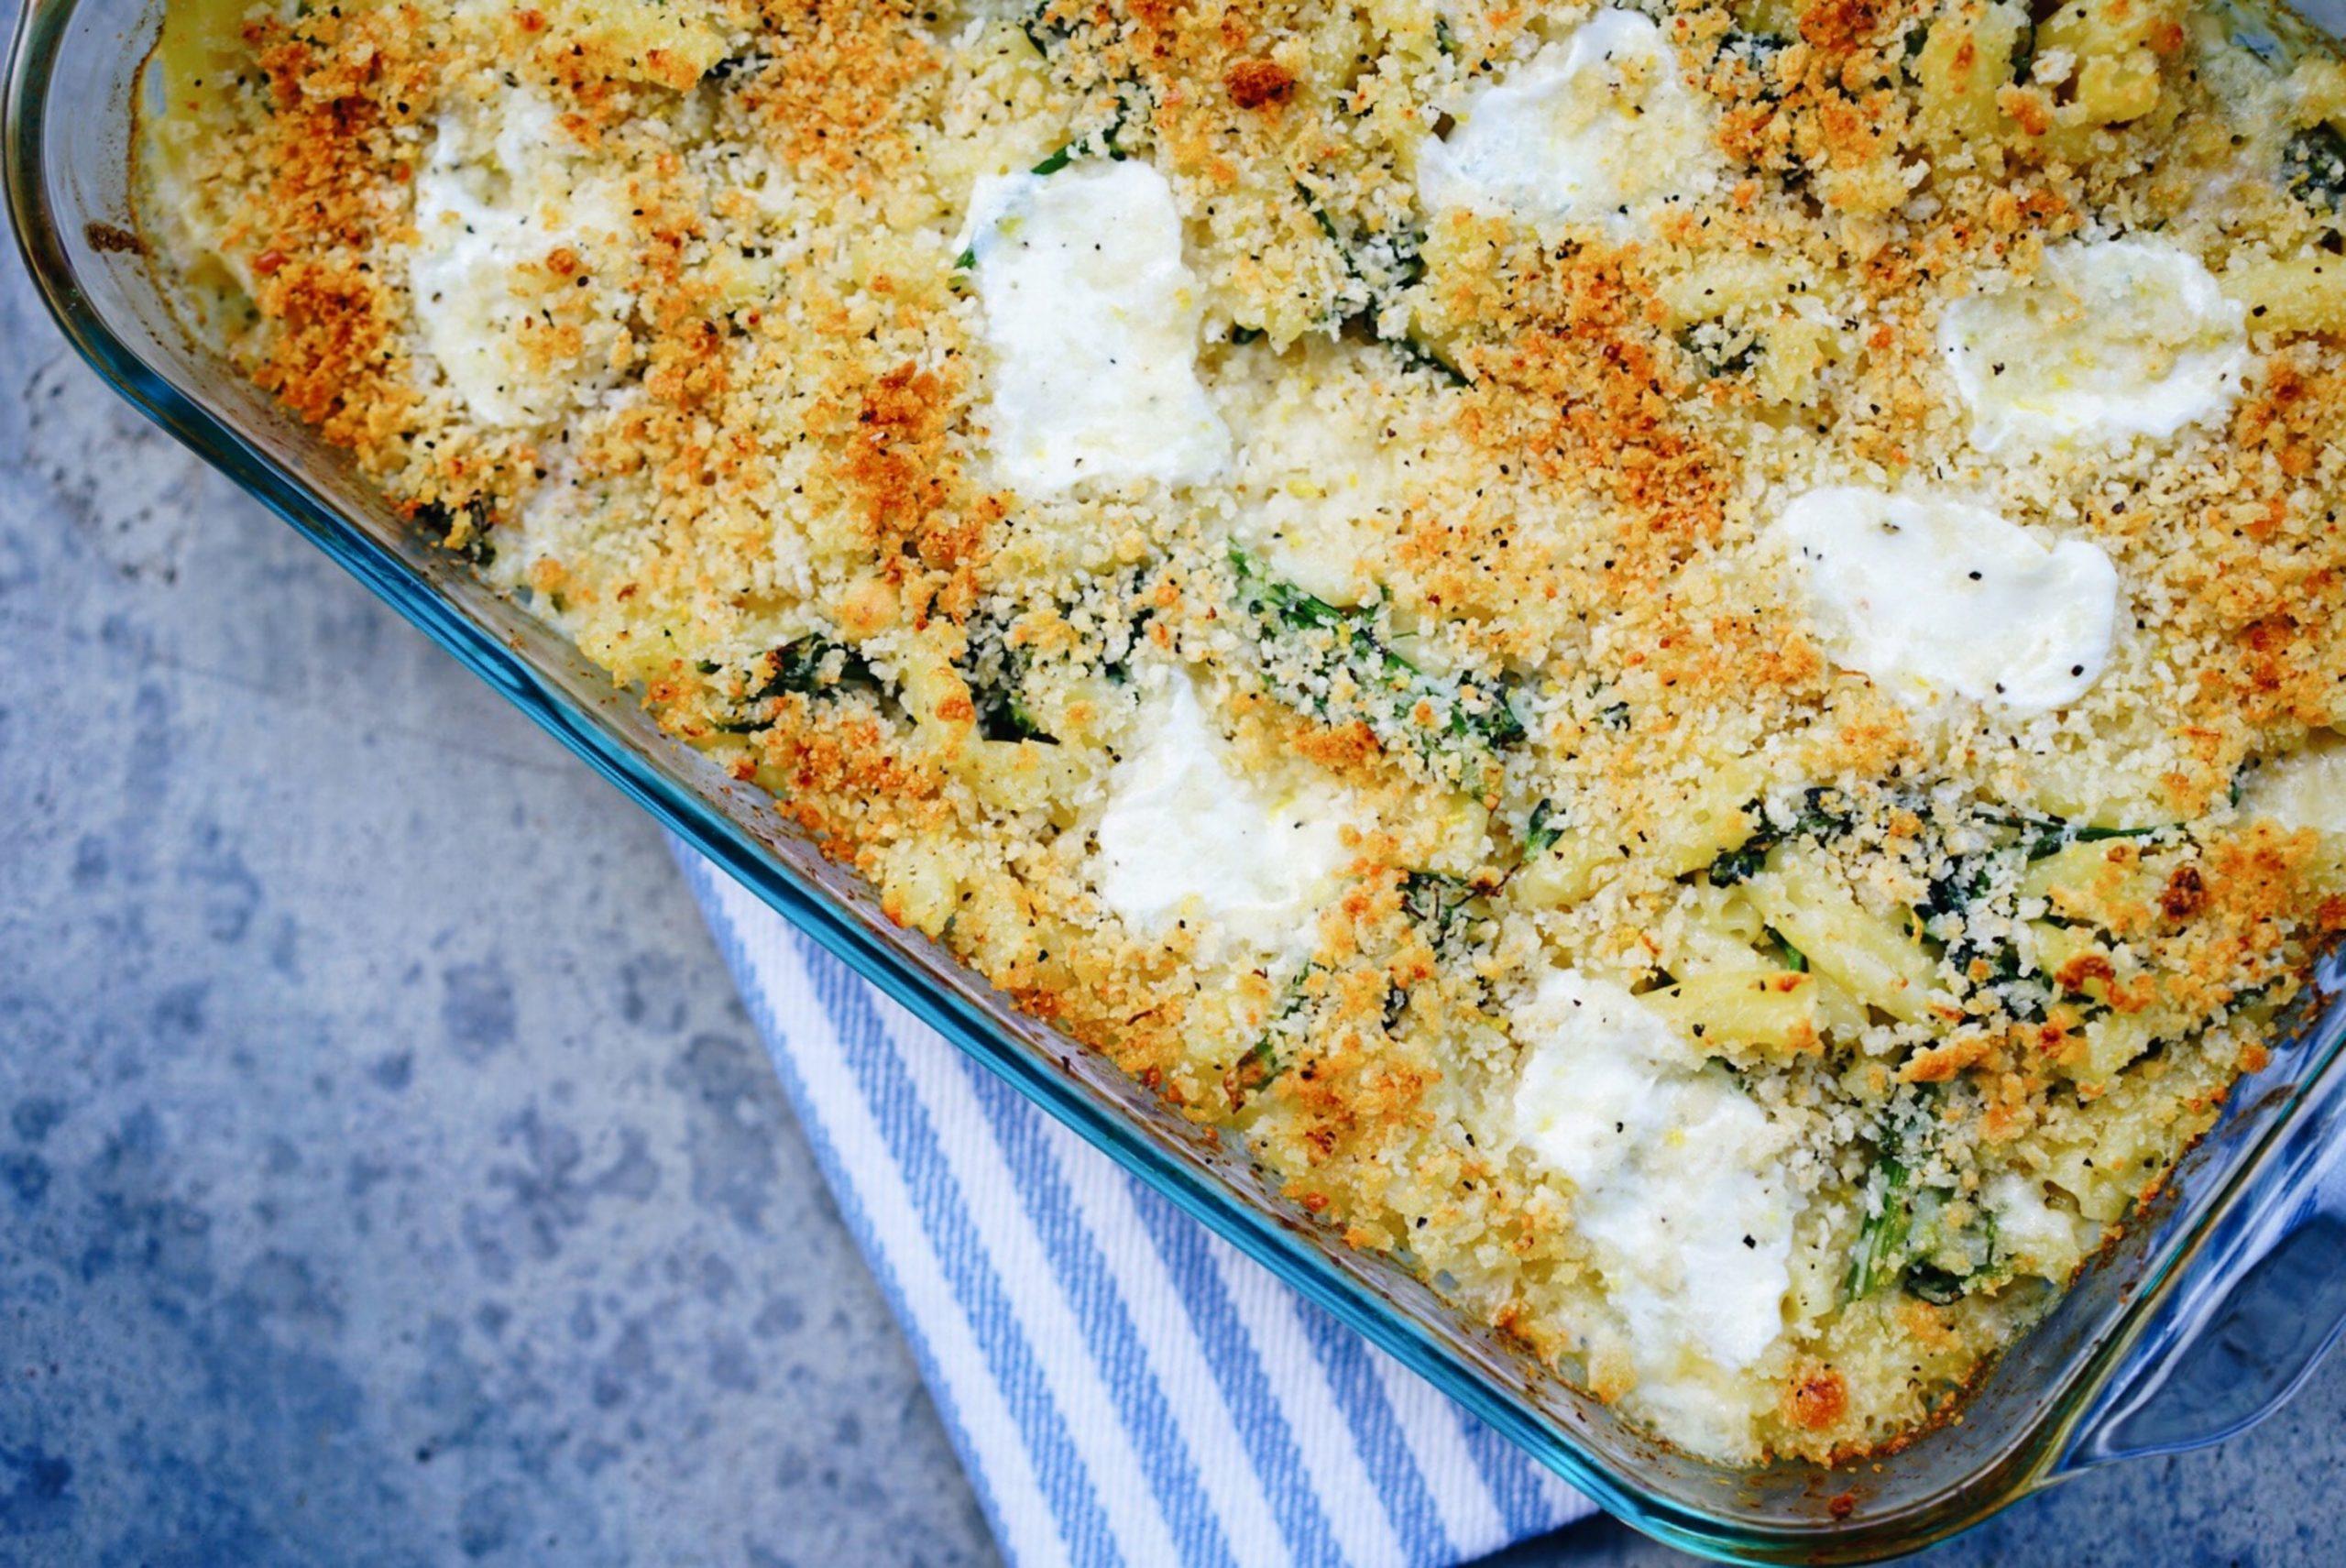 Parmigiana patate zucchine